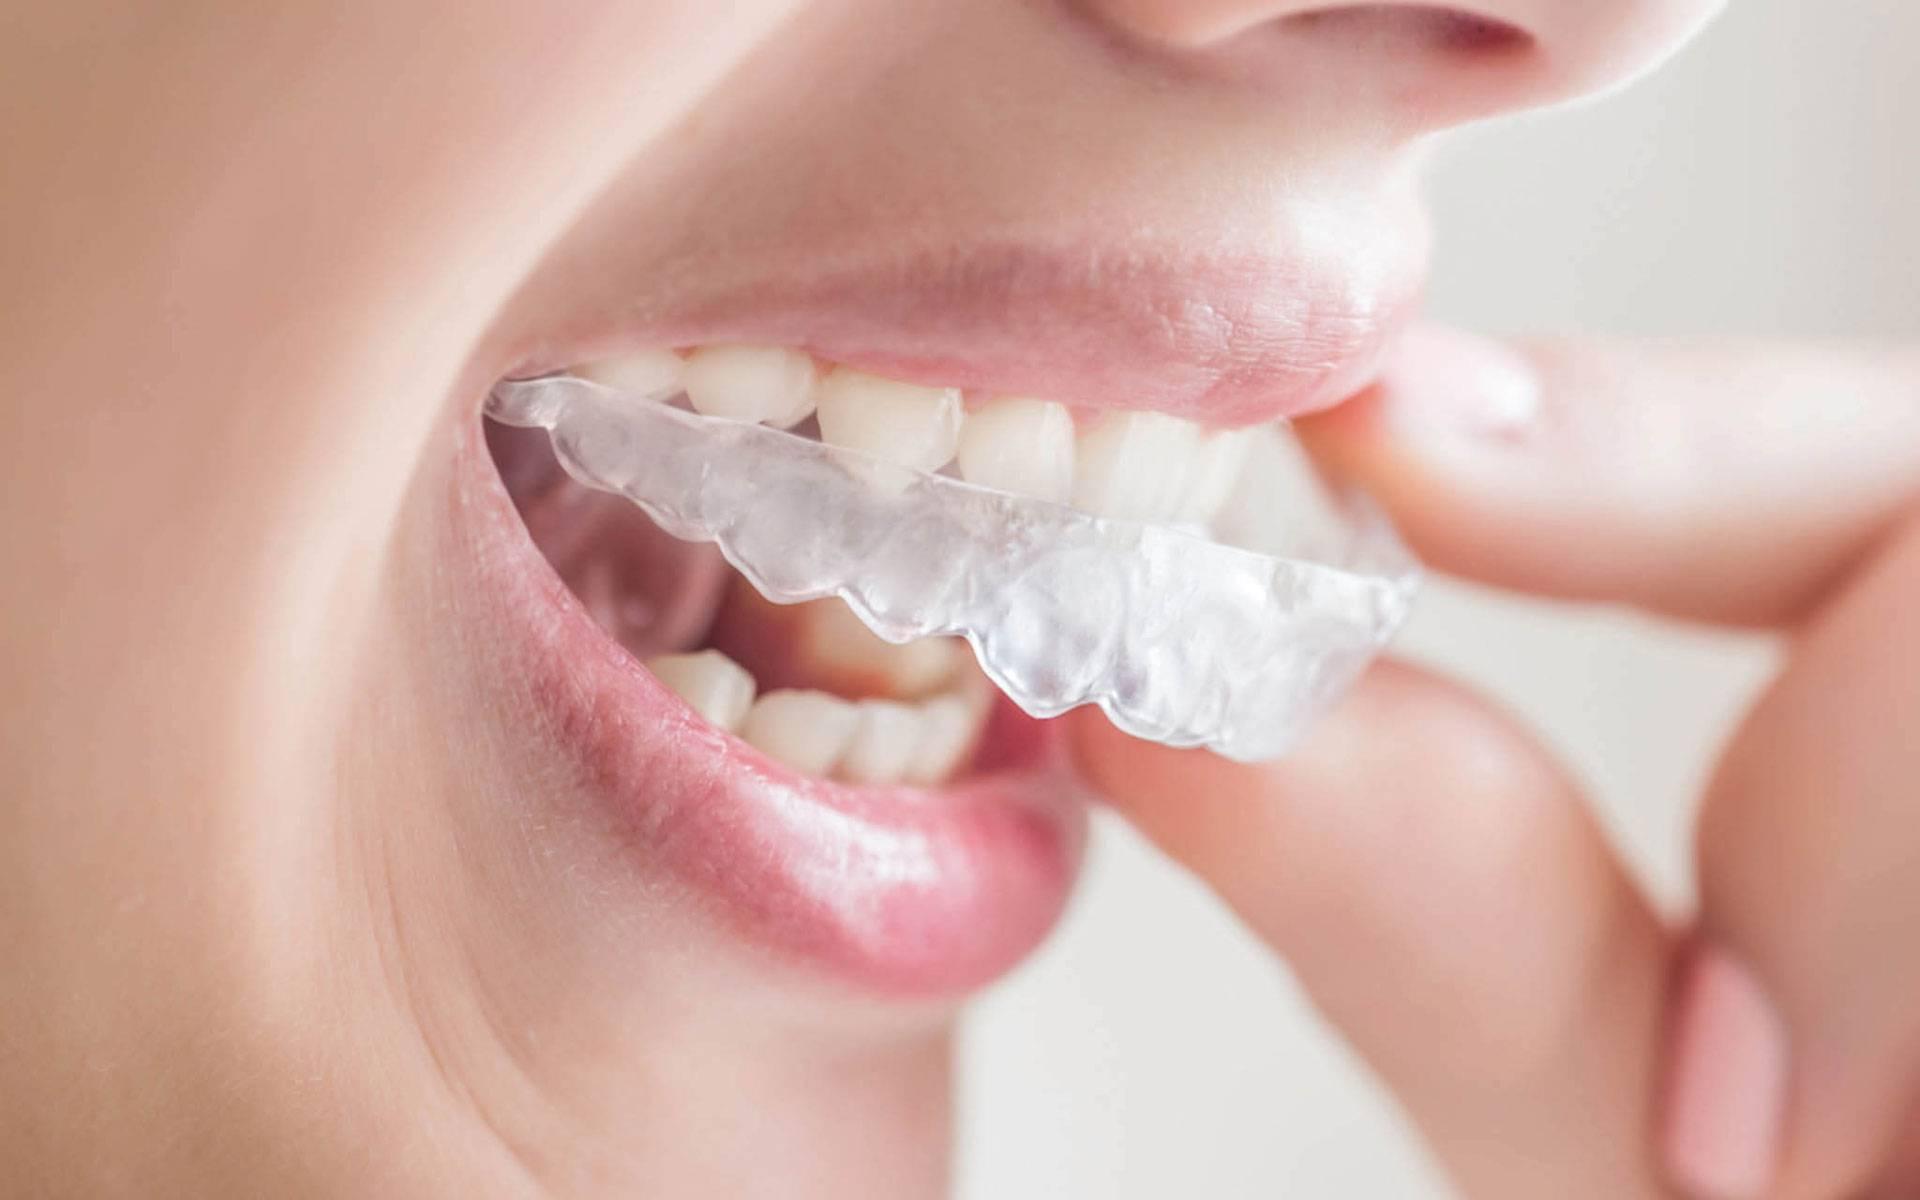 Simply Teeth - dentist  | Photo 4 of 4 | Address: 438 Green Ln, Ilford IG3 9LD, UK | Phone: +44 20 8590 0575